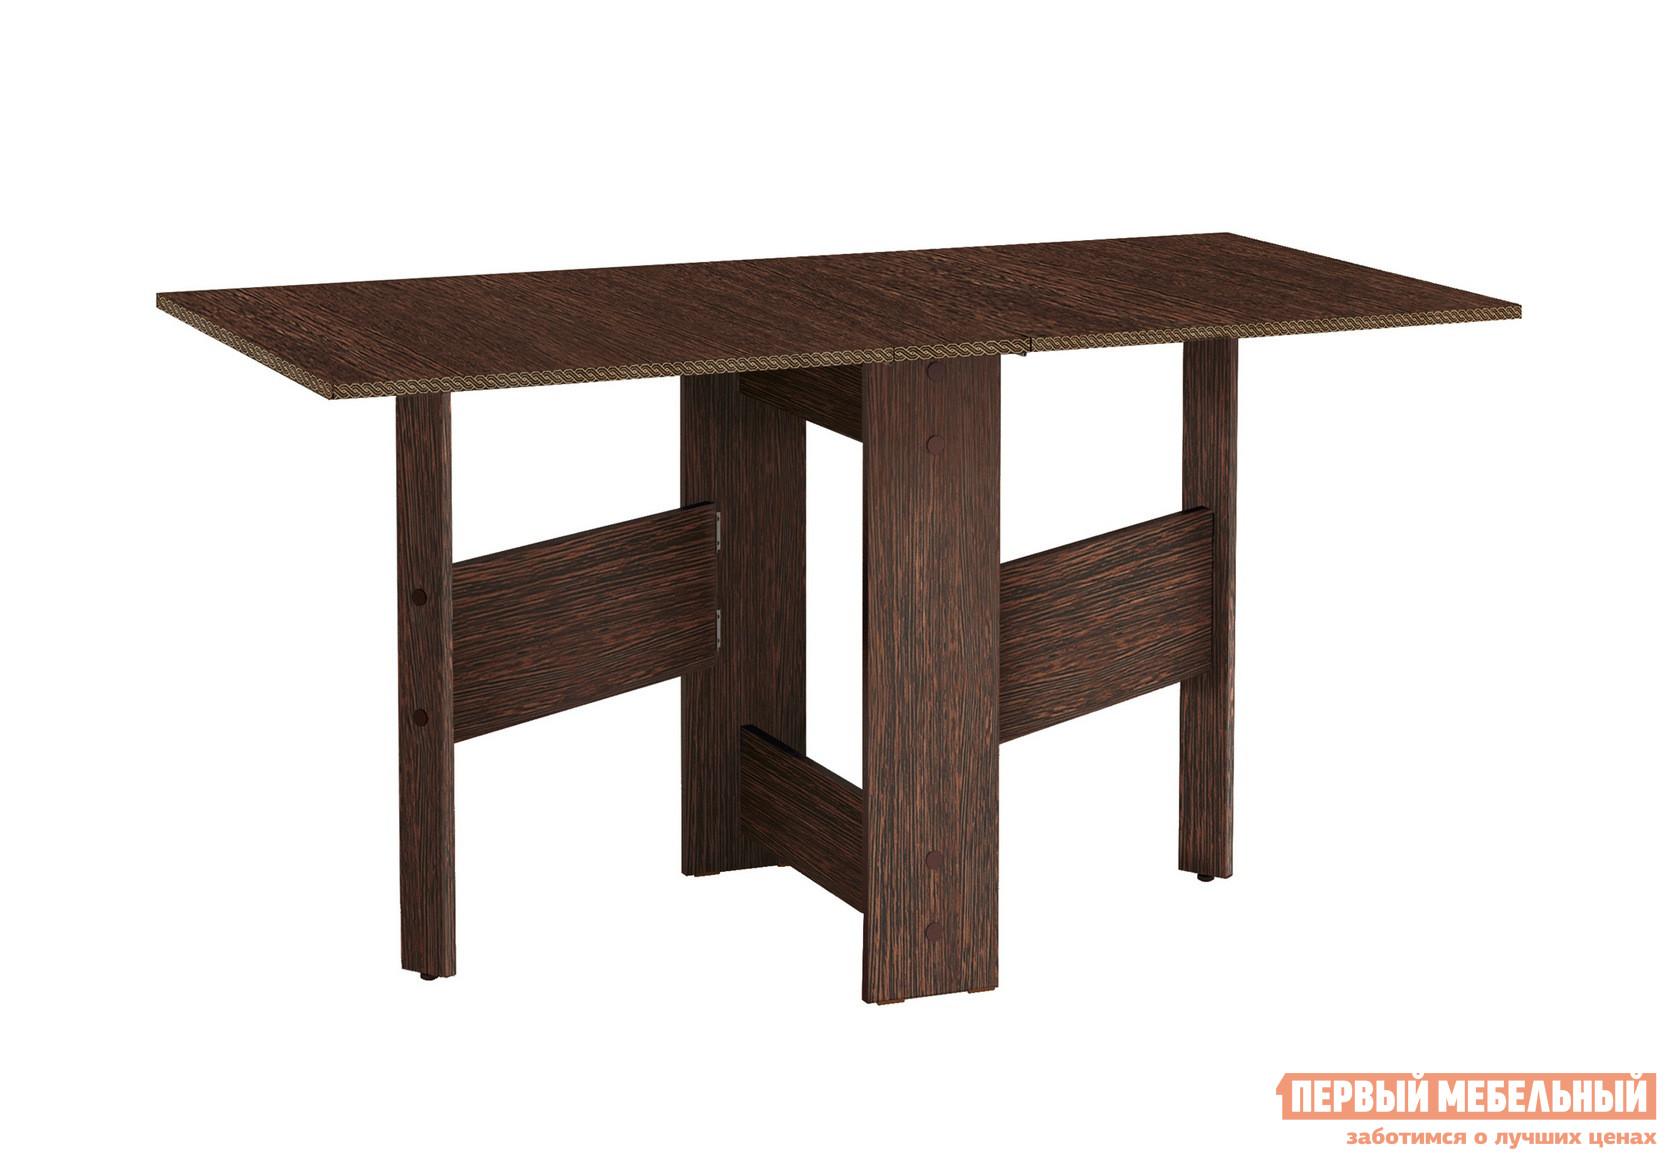 Узкий кухонный стол-книжка Витра Колибри-15 Лайт письменный стол витра 41 42 41